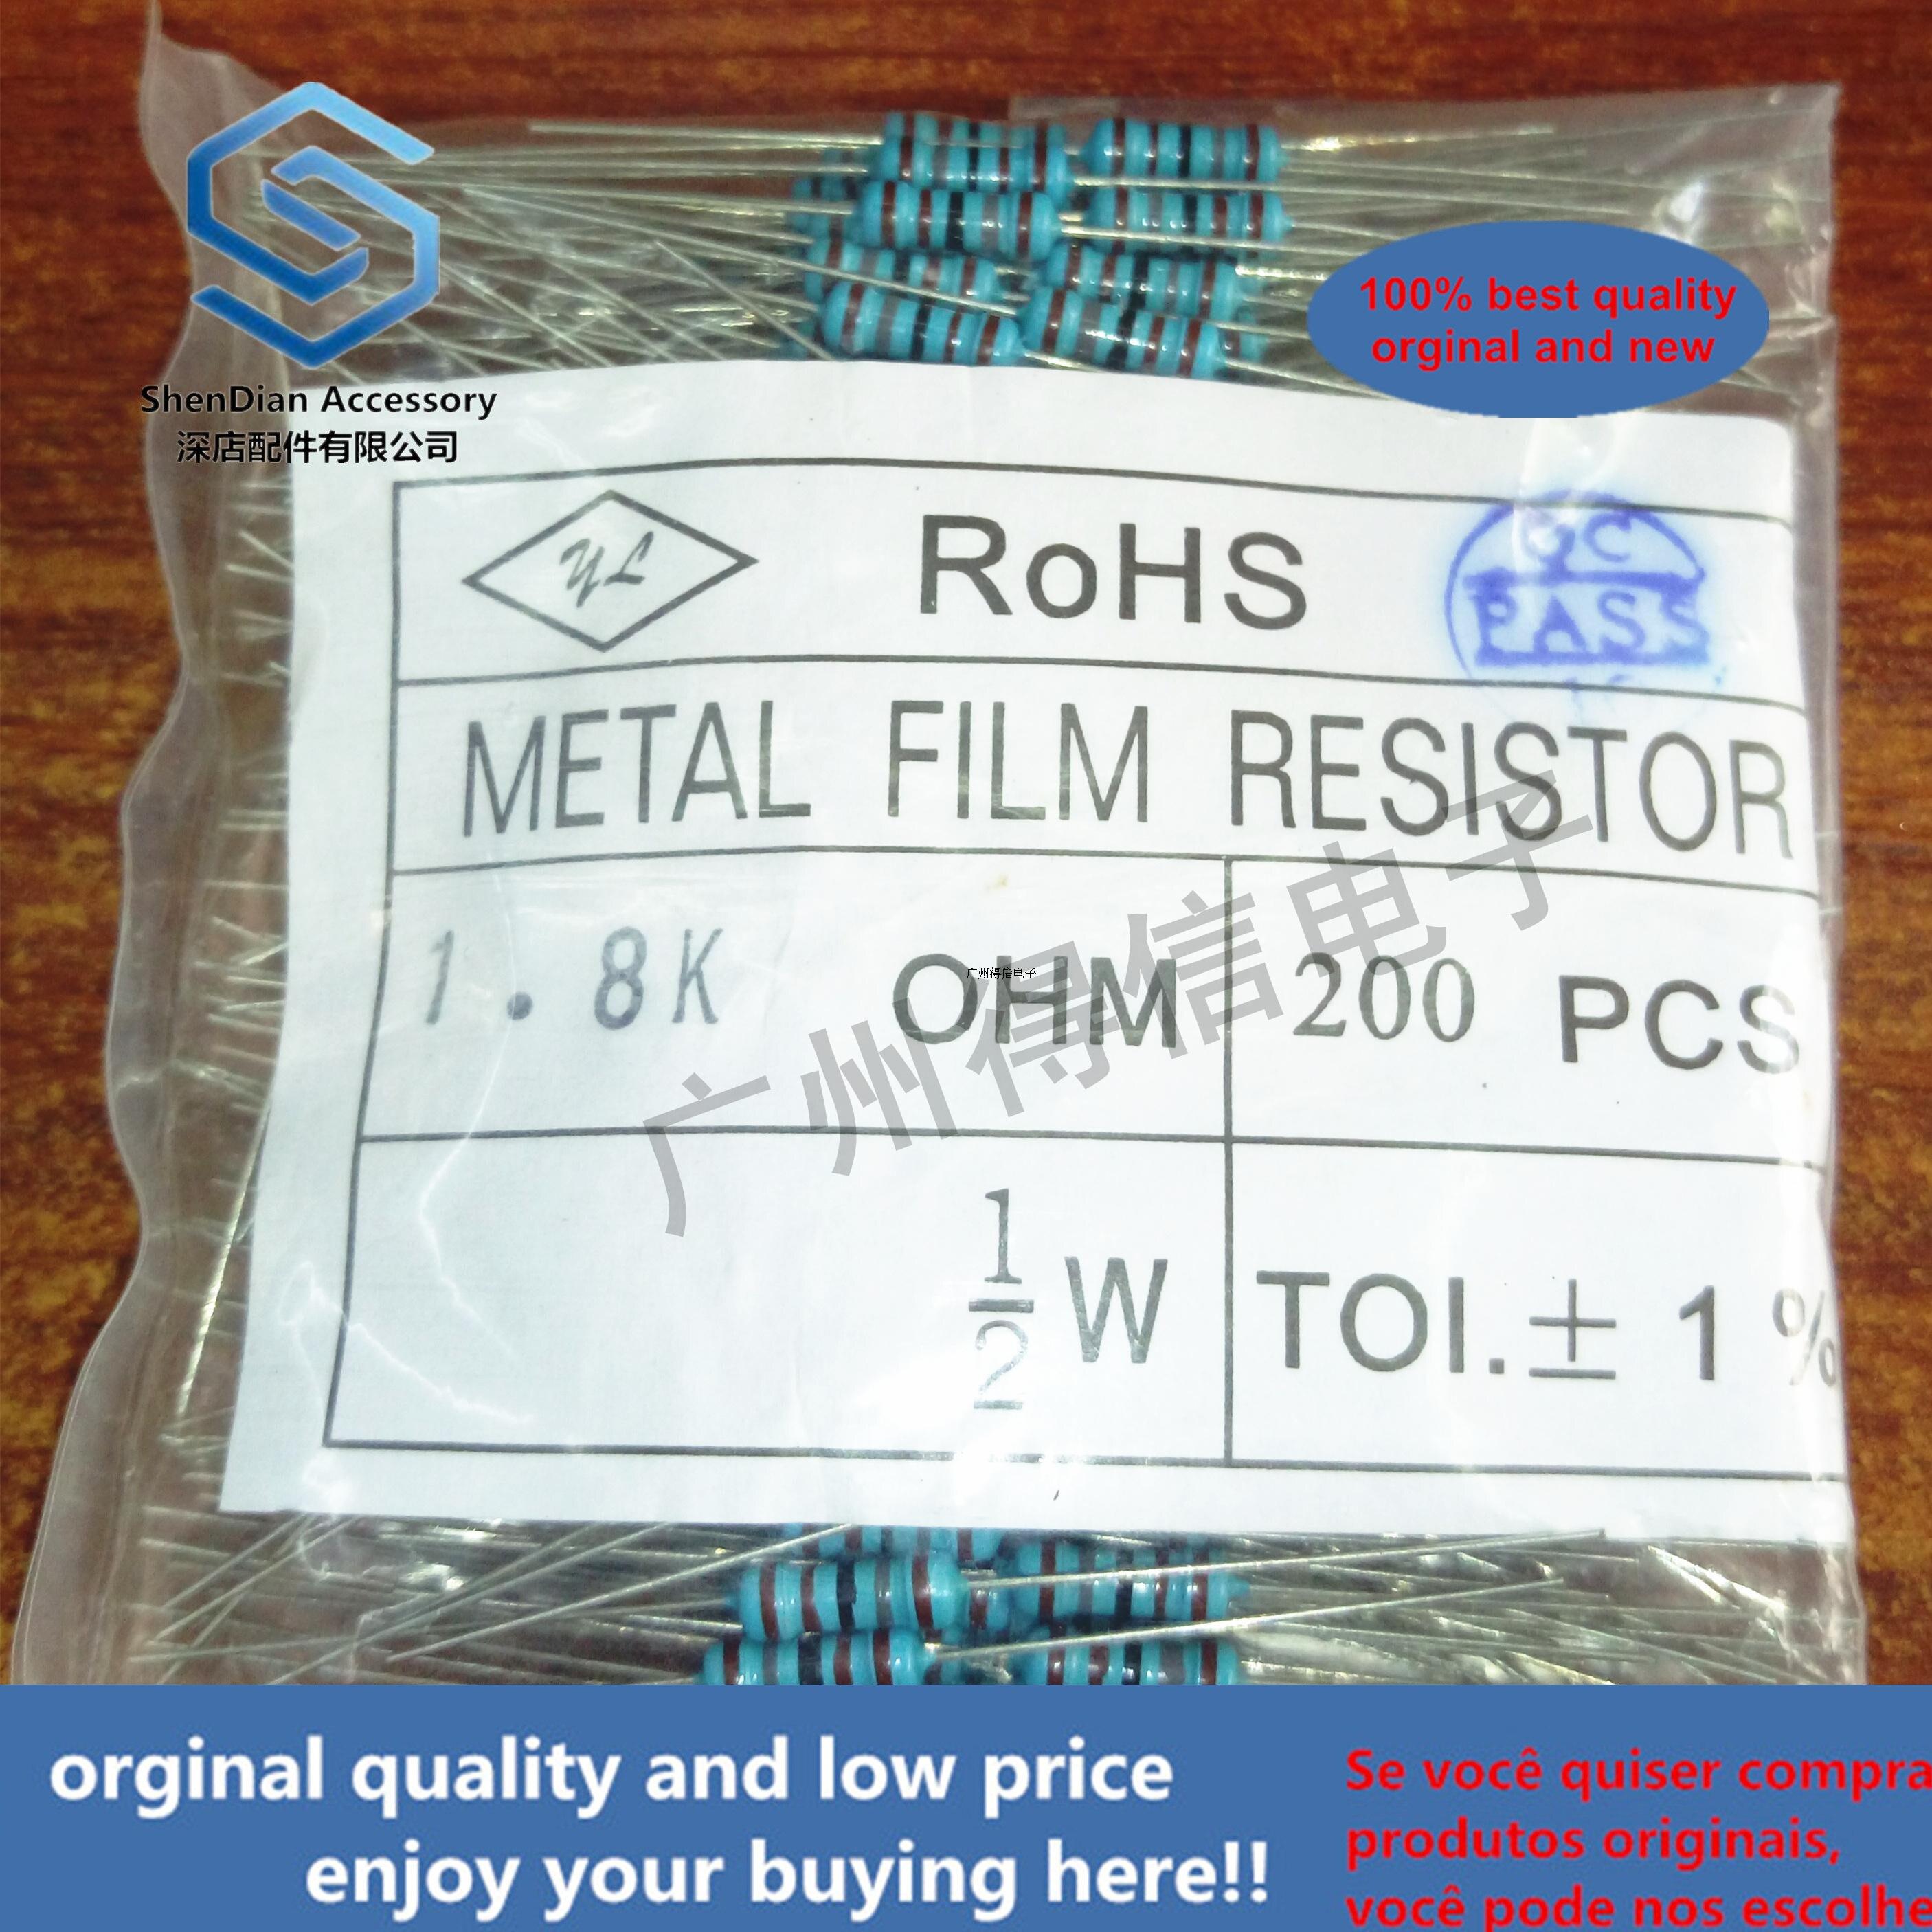 200pcs 1 / 2W 22K 22000 Euro 1% Brand New Metal Film Iron Feet Resistor Bag 200 Pcs Per Pack